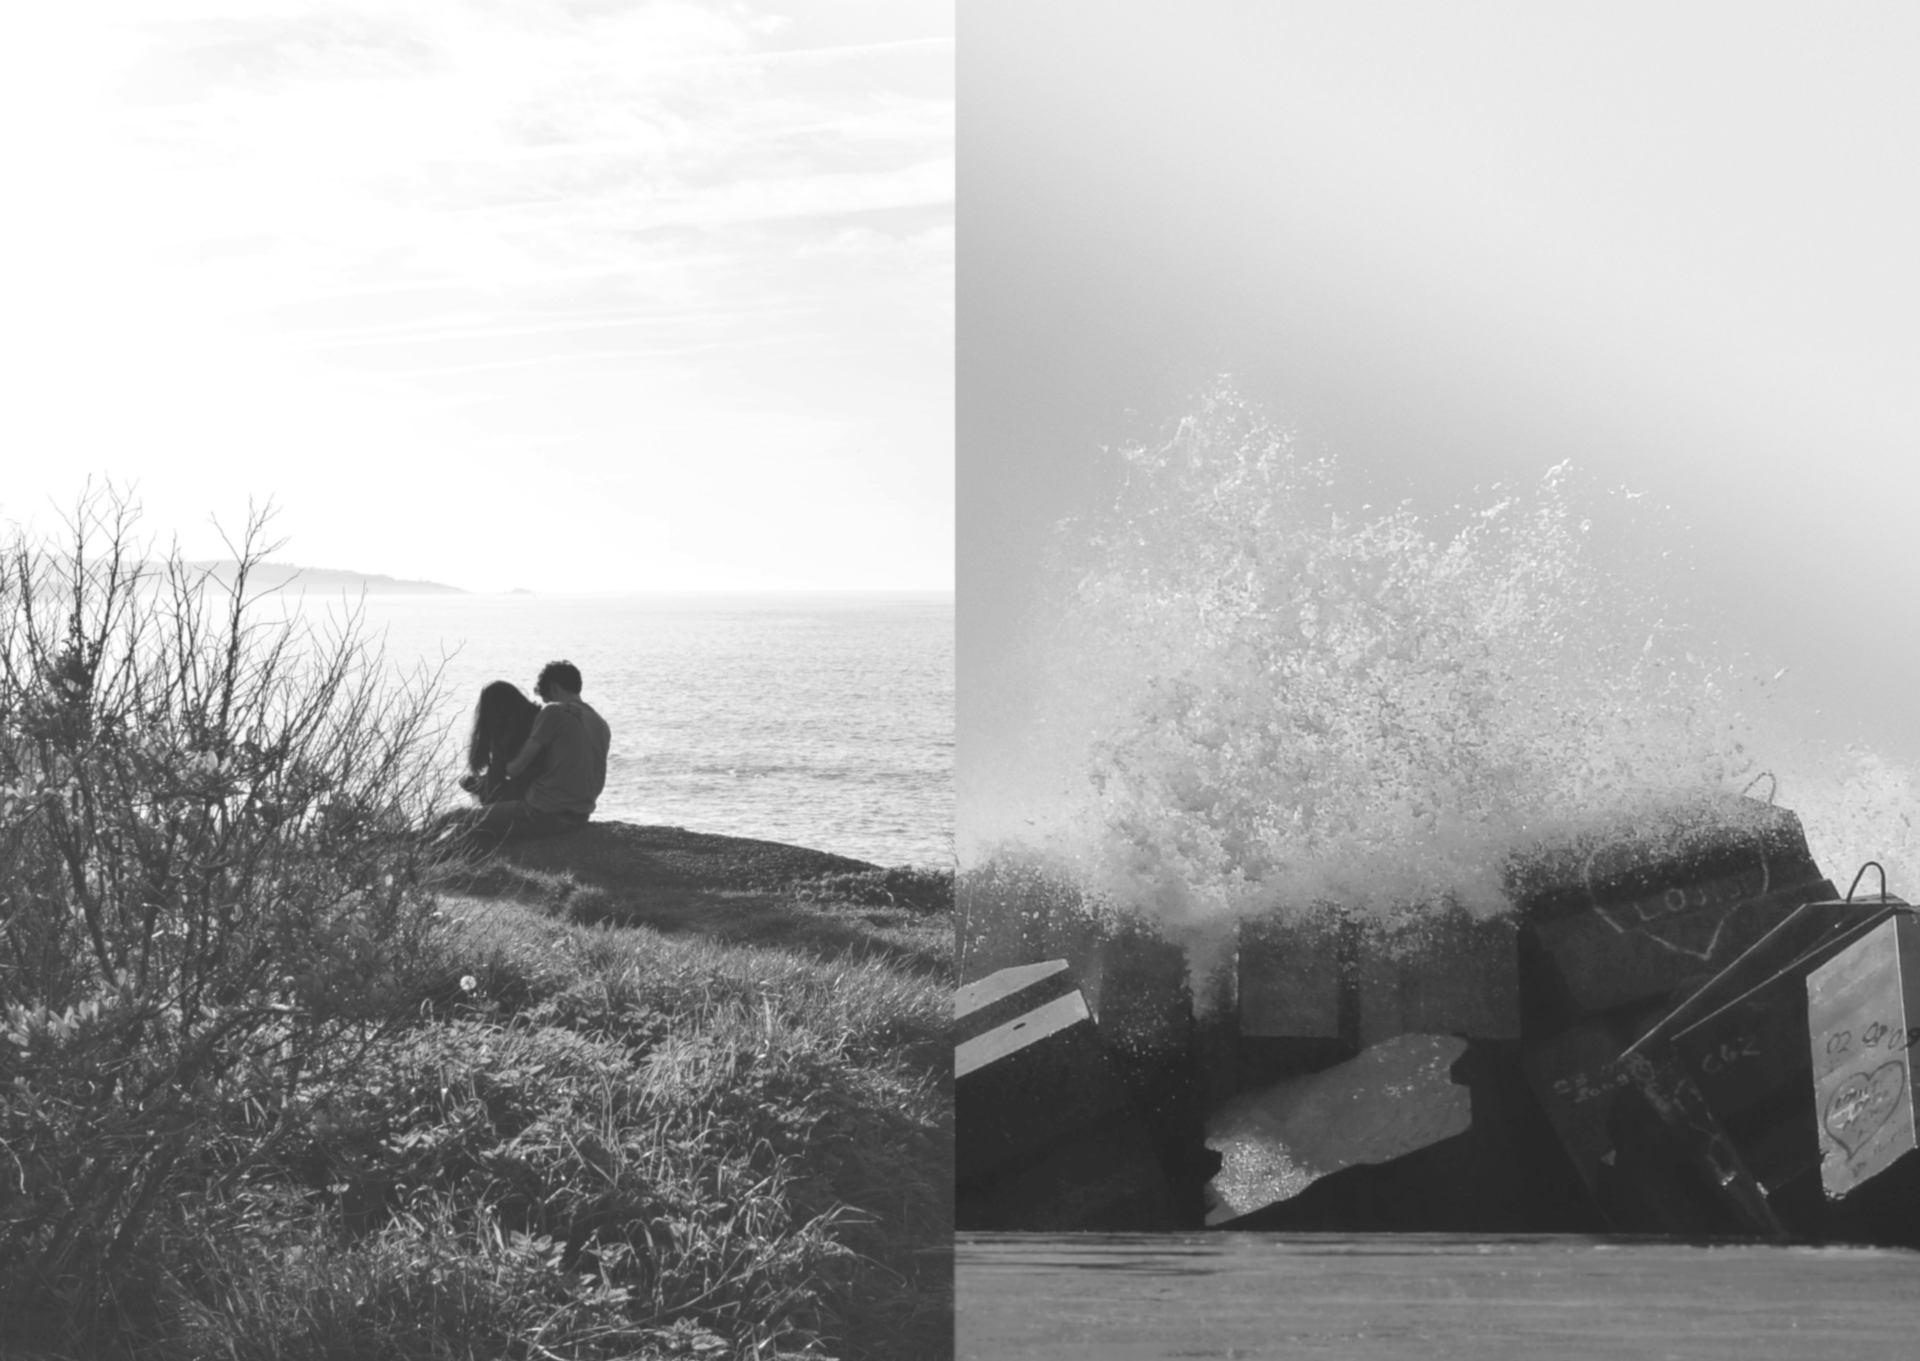 Amour/Passion